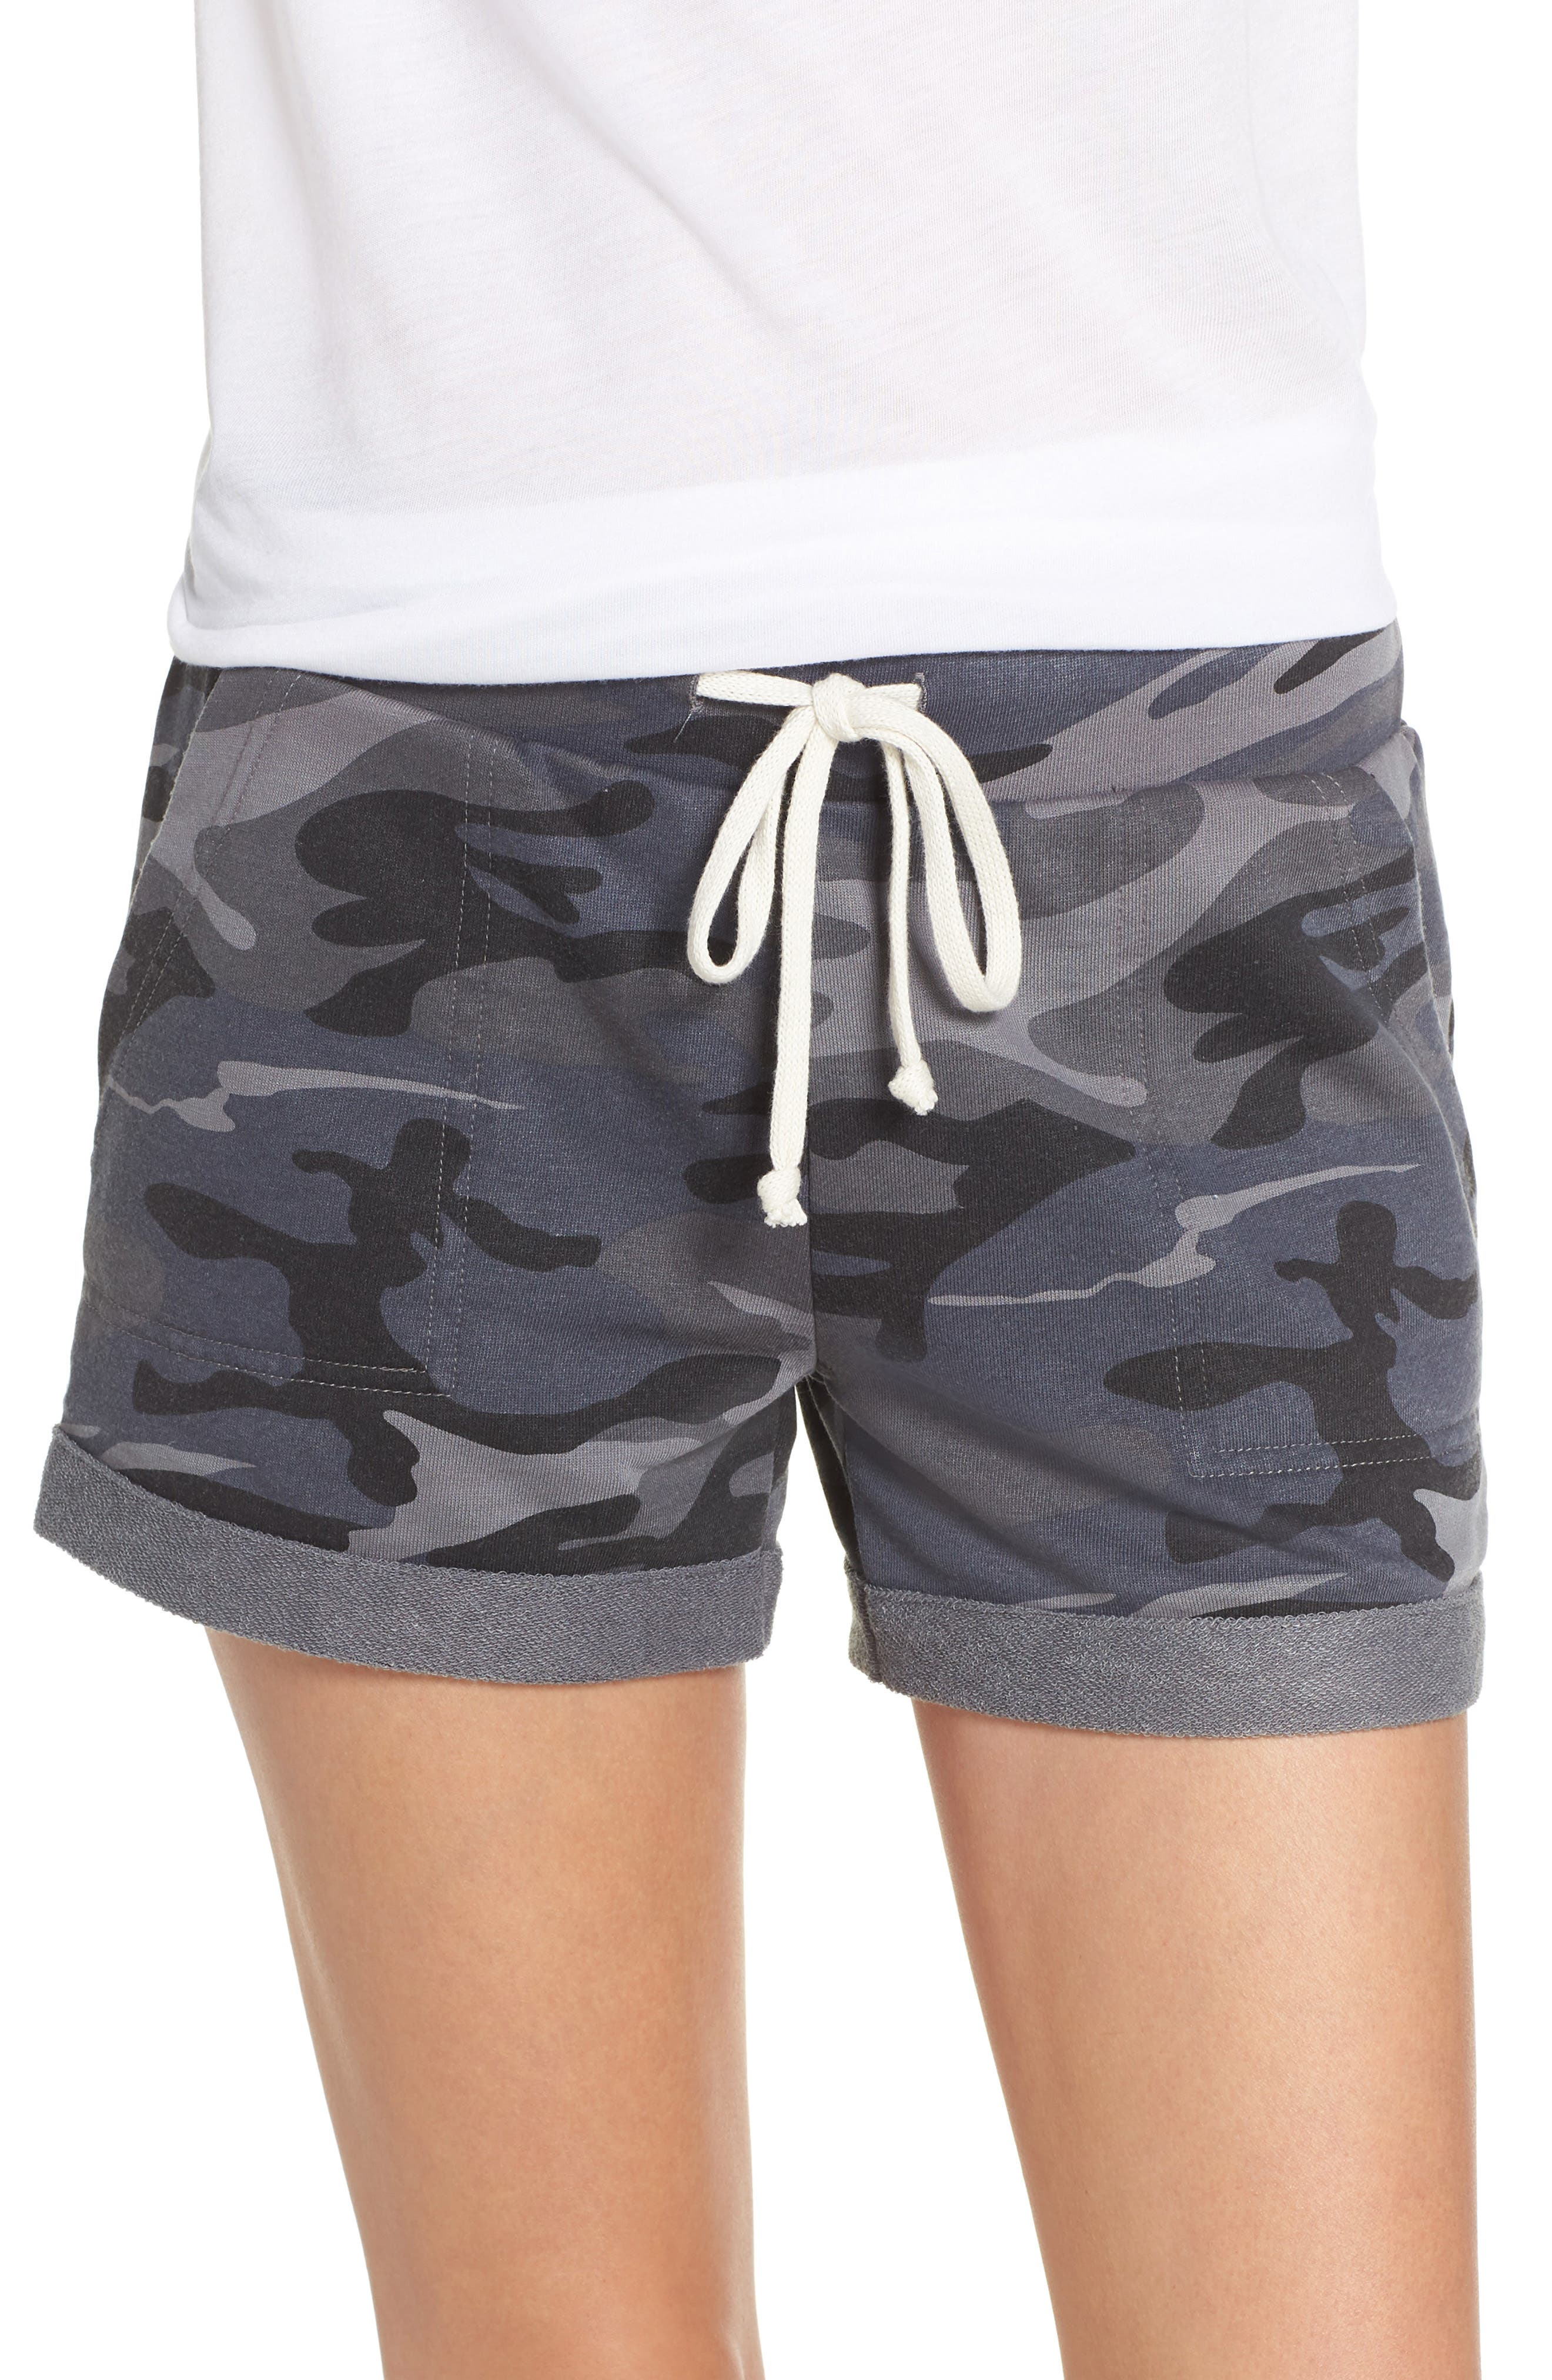 ALTERNATIVE Camo Lounge Shorts, Main, color, 099